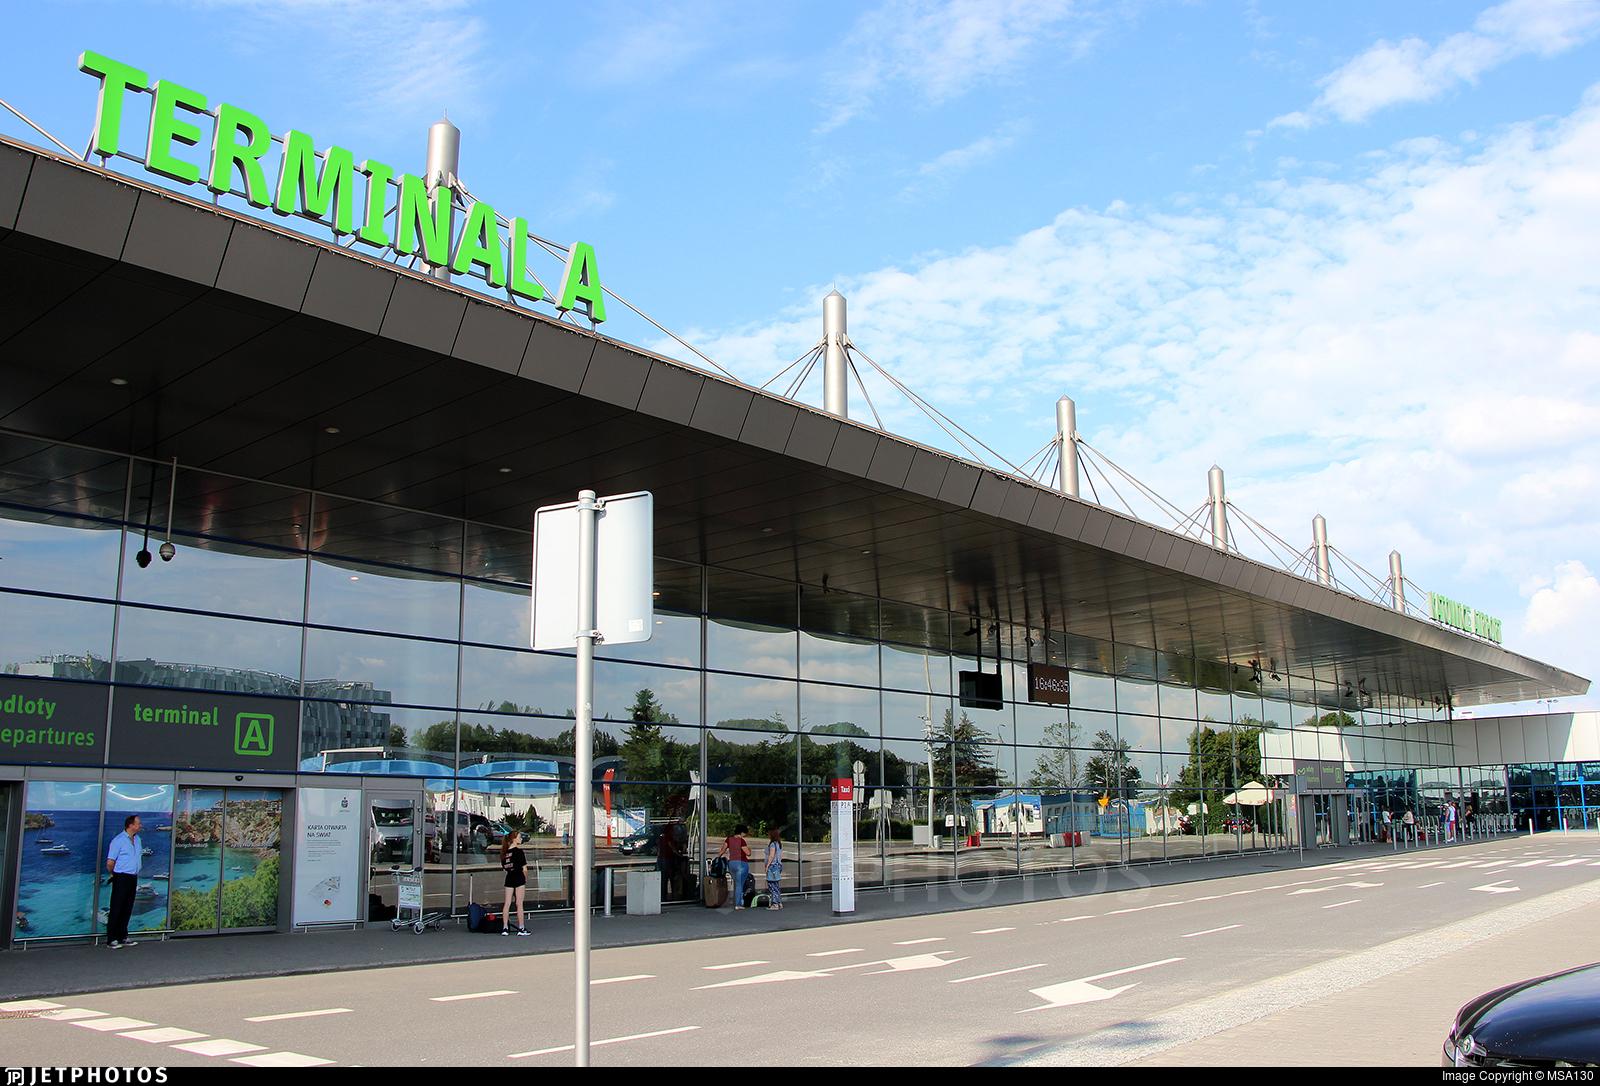 EPKT - Airport - Terminal